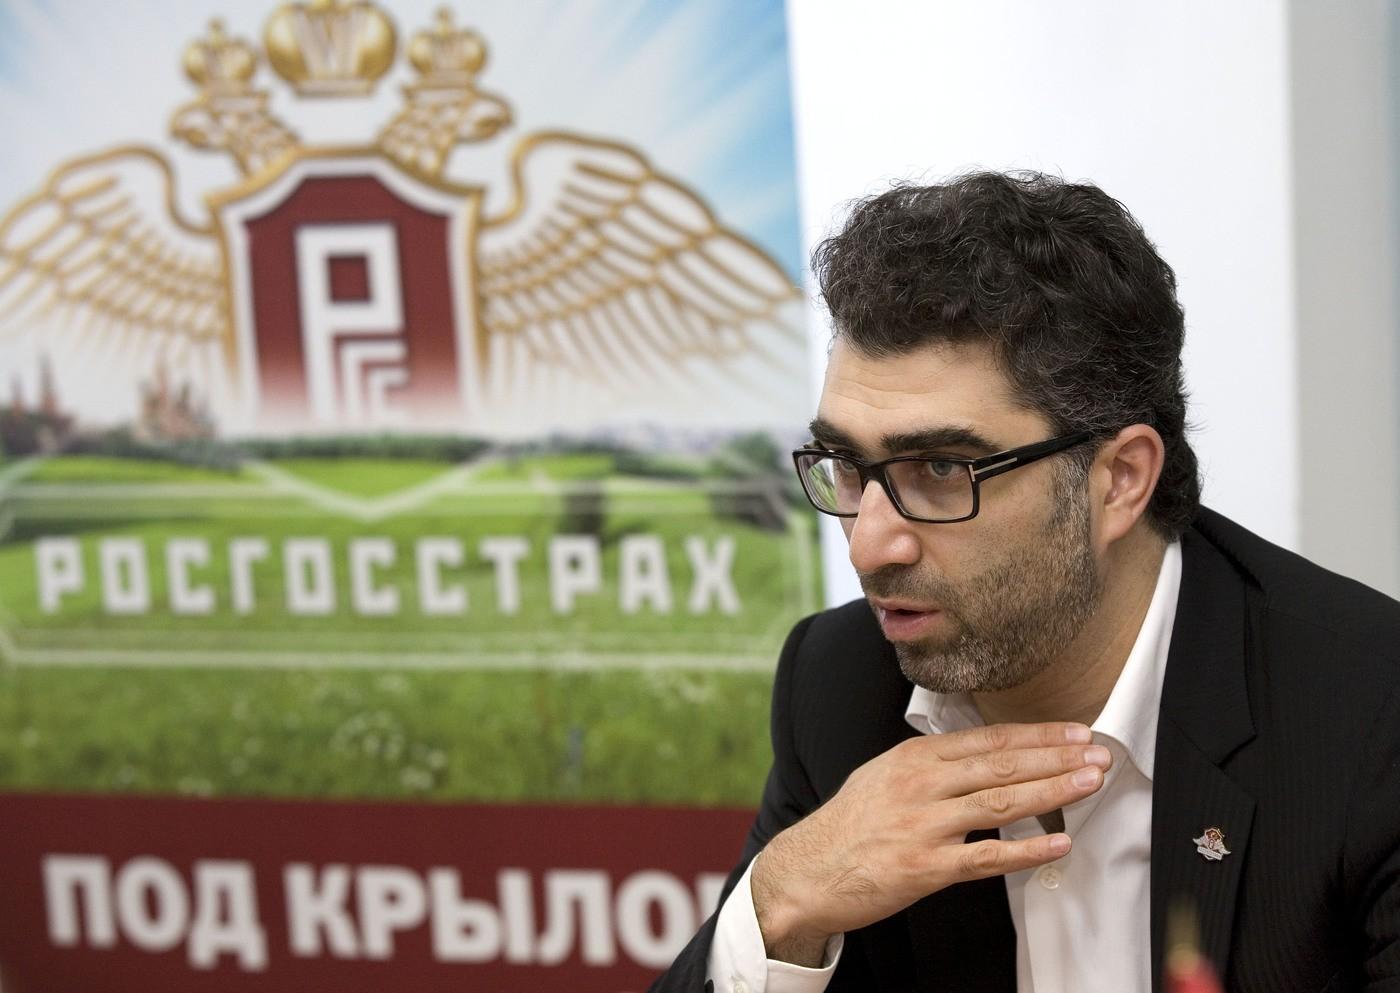 Президент «Росгосстраха» Хачатуров объявил освоем уходе